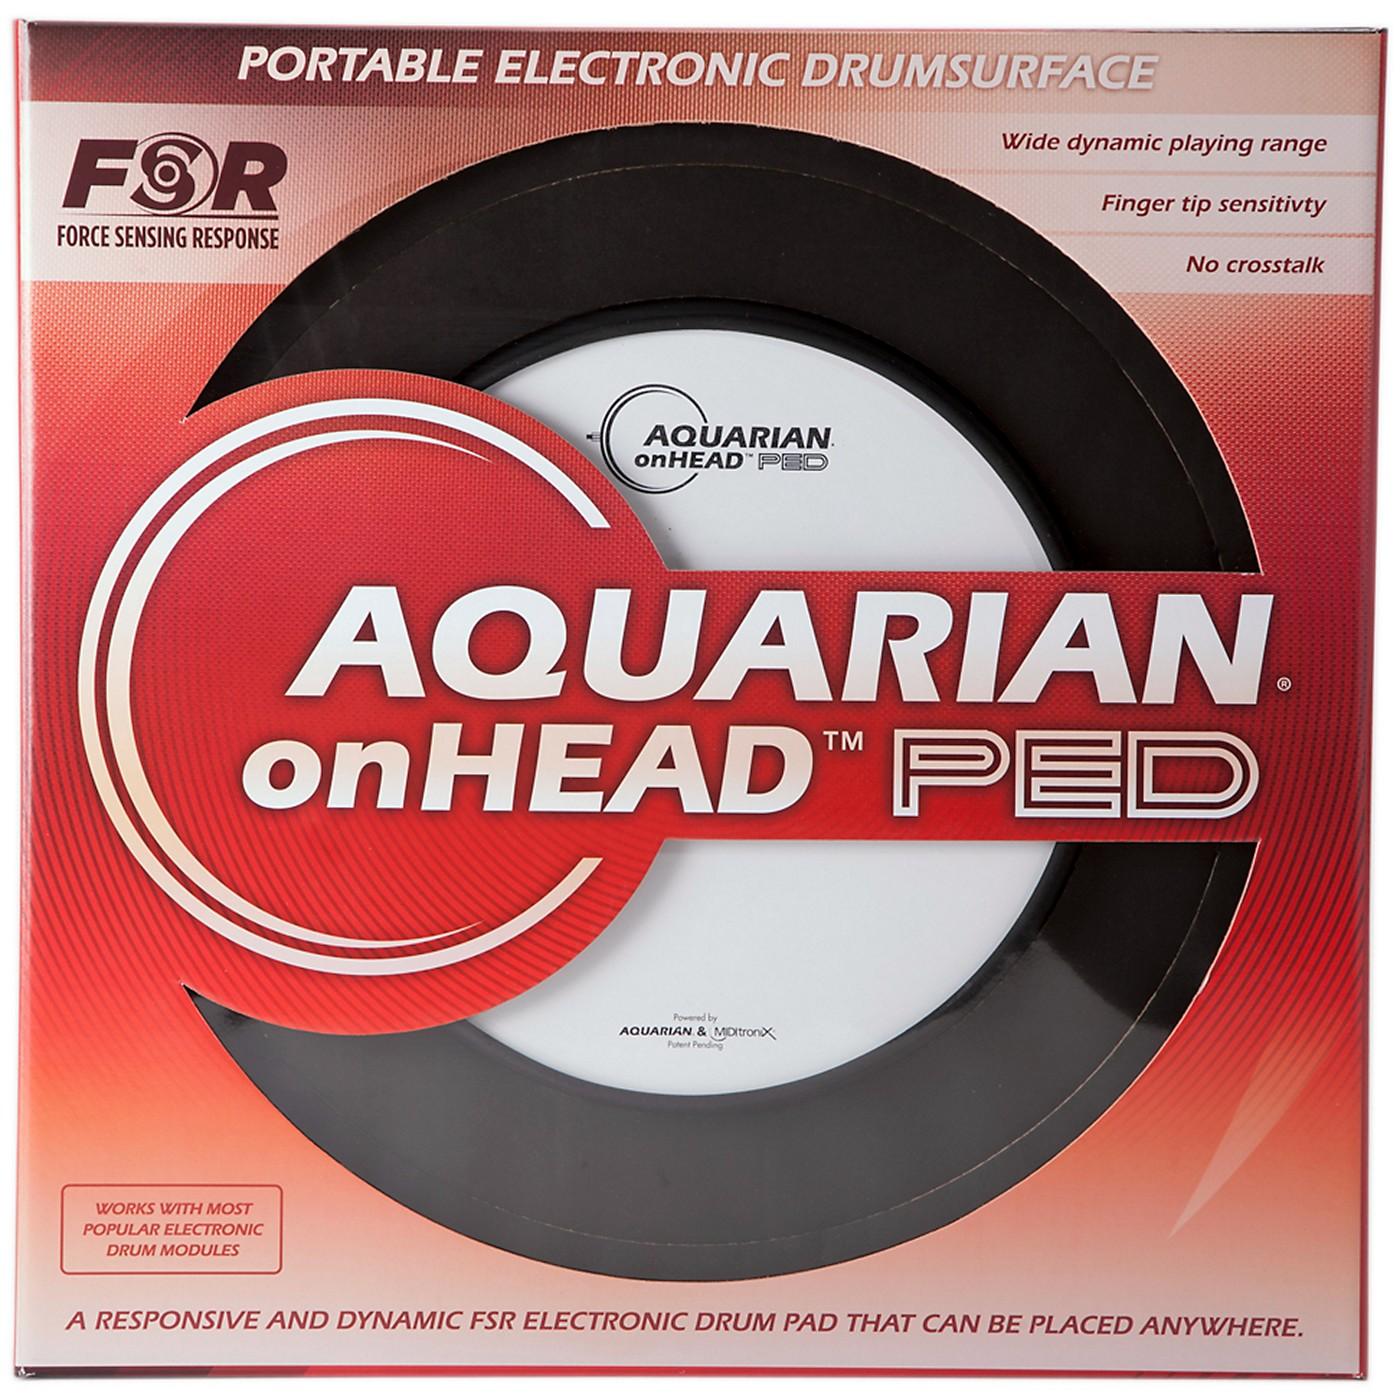 Aquarian onHEAD Portable Electronic Drumsurface thumbnail